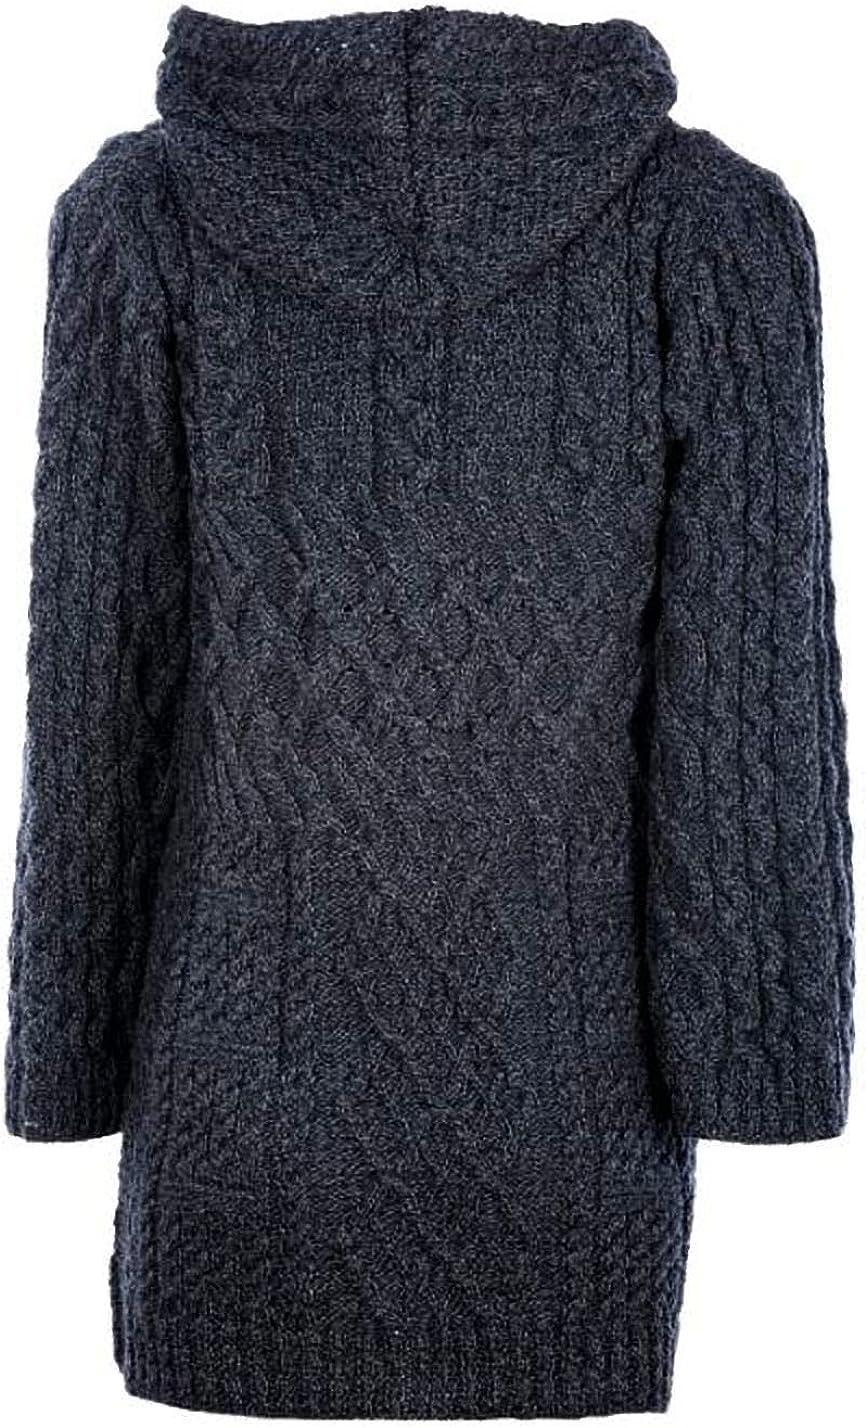 Aran Woollen Mills Traditional Irish Ladies Merino Wool Cardigan Sweater with Pockets